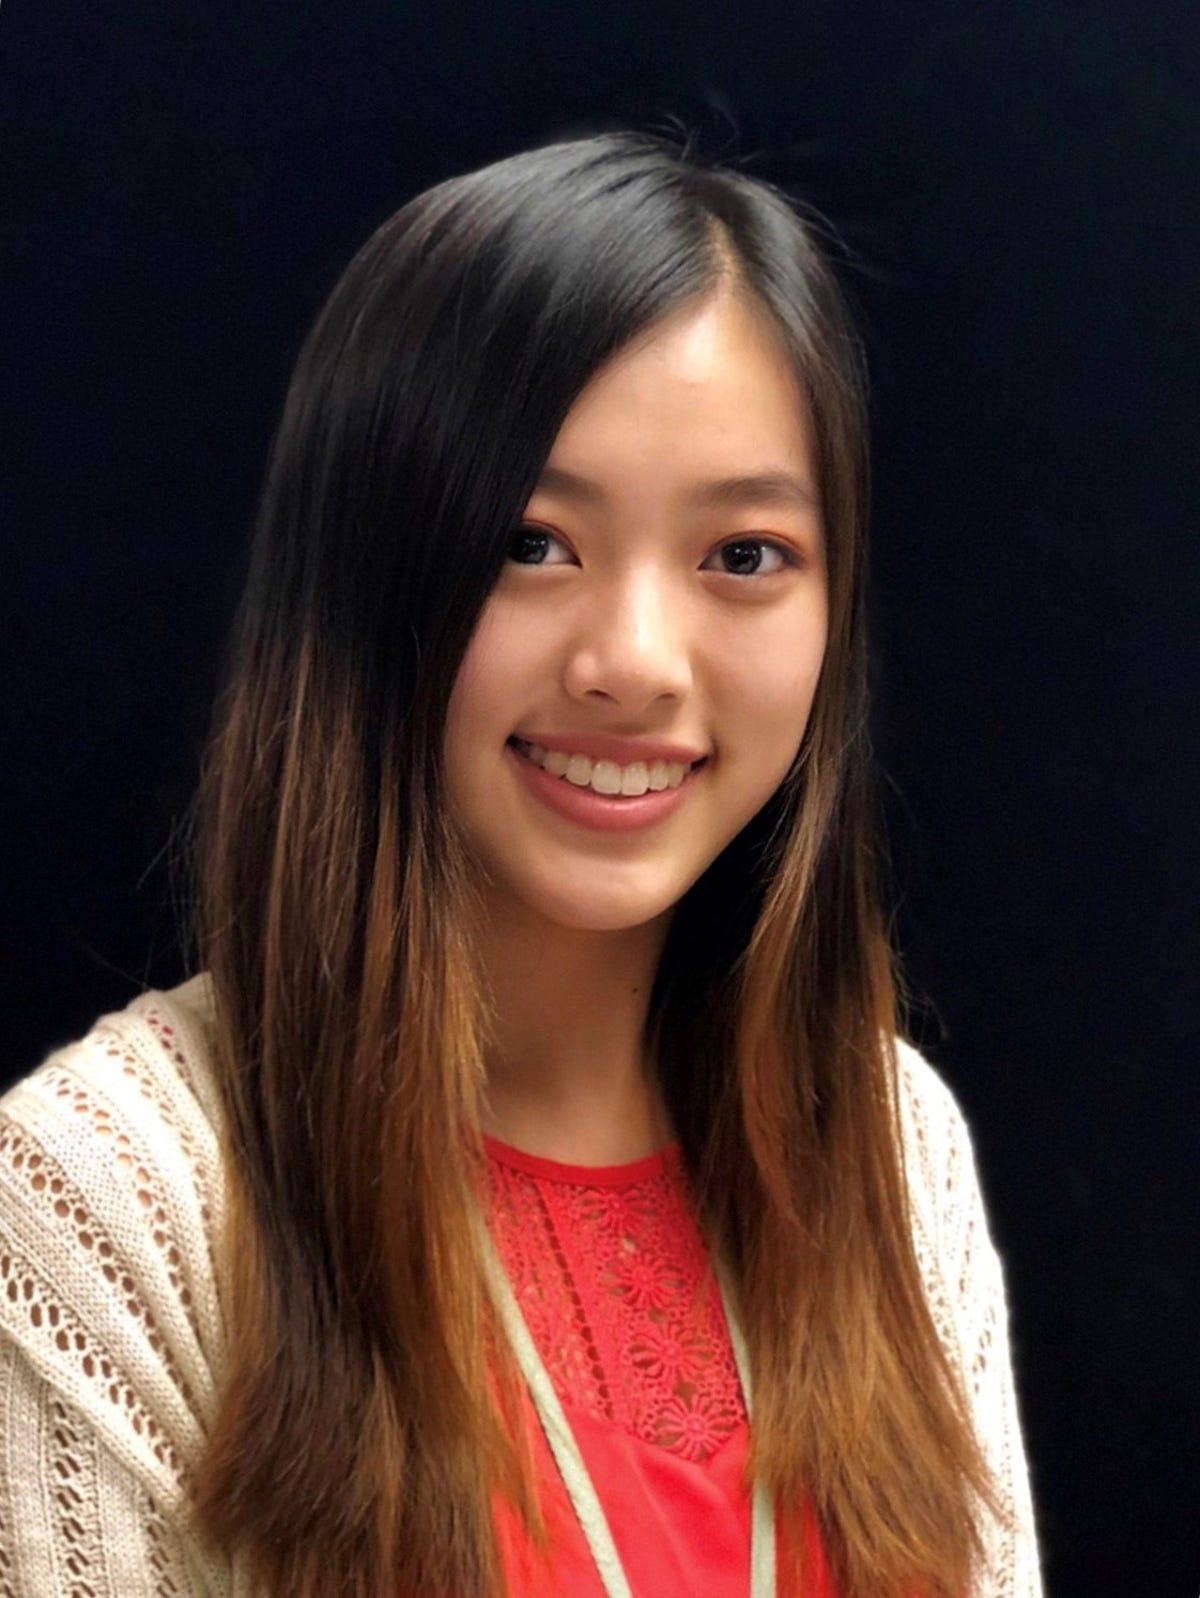 Abilene's Faith Fang earns SMU-based scholarship in National